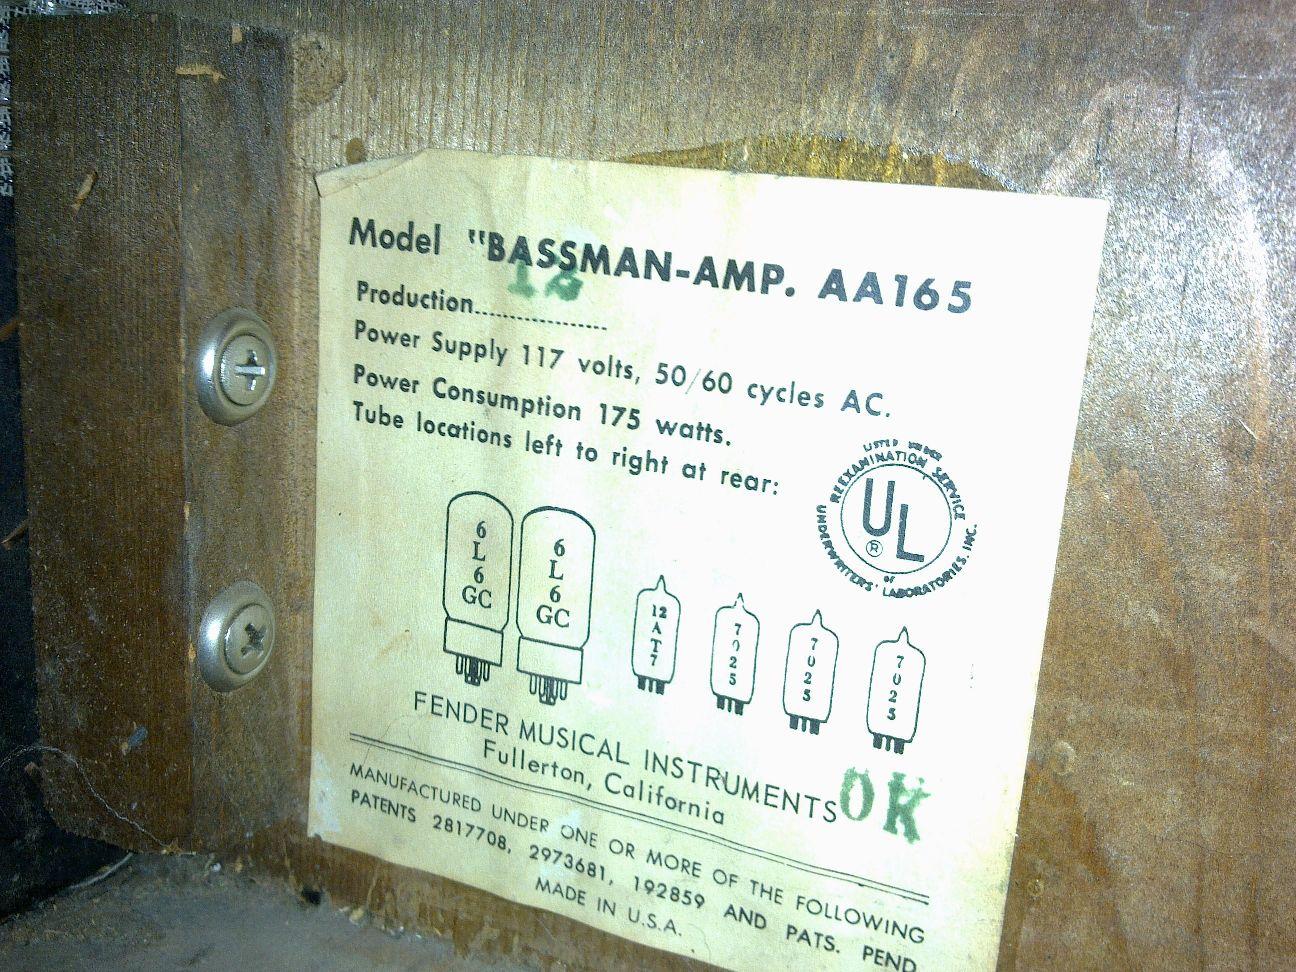 Paul P S Amps Ab165 Bassman Refurbishment Amp Modification